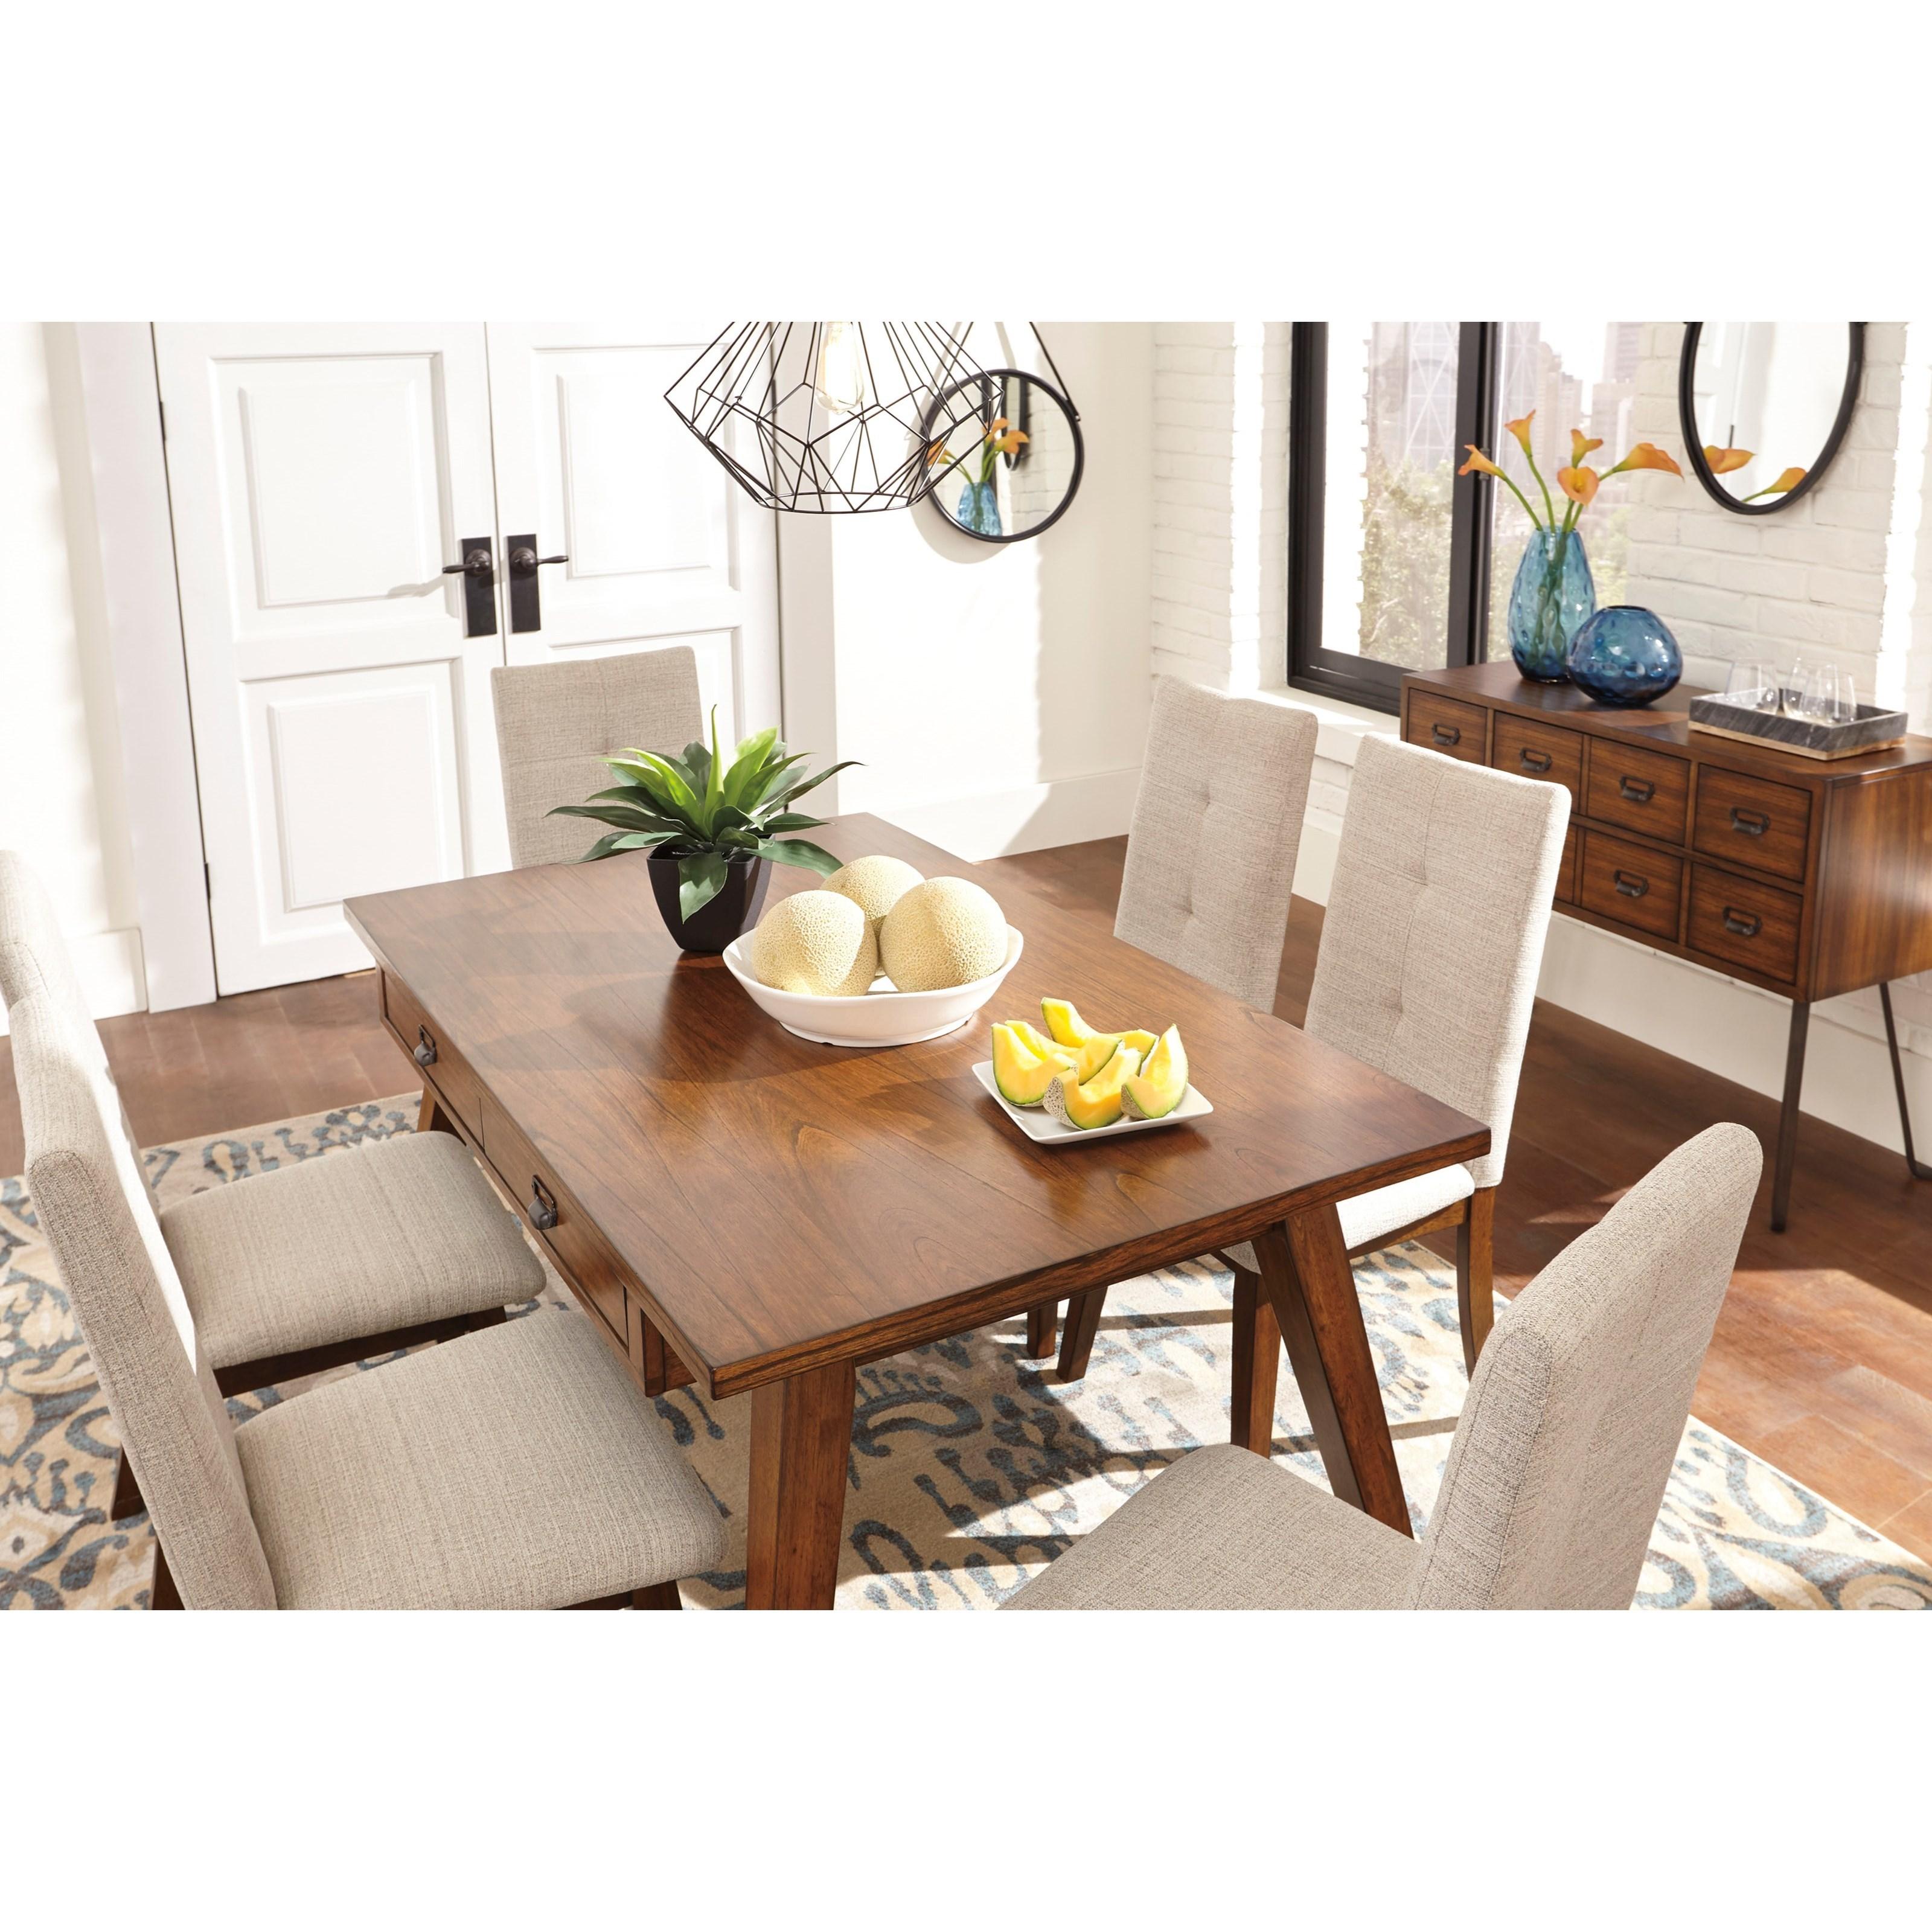 signature design by ashley centiar casual dining room. Black Bedroom Furniture Sets. Home Design Ideas